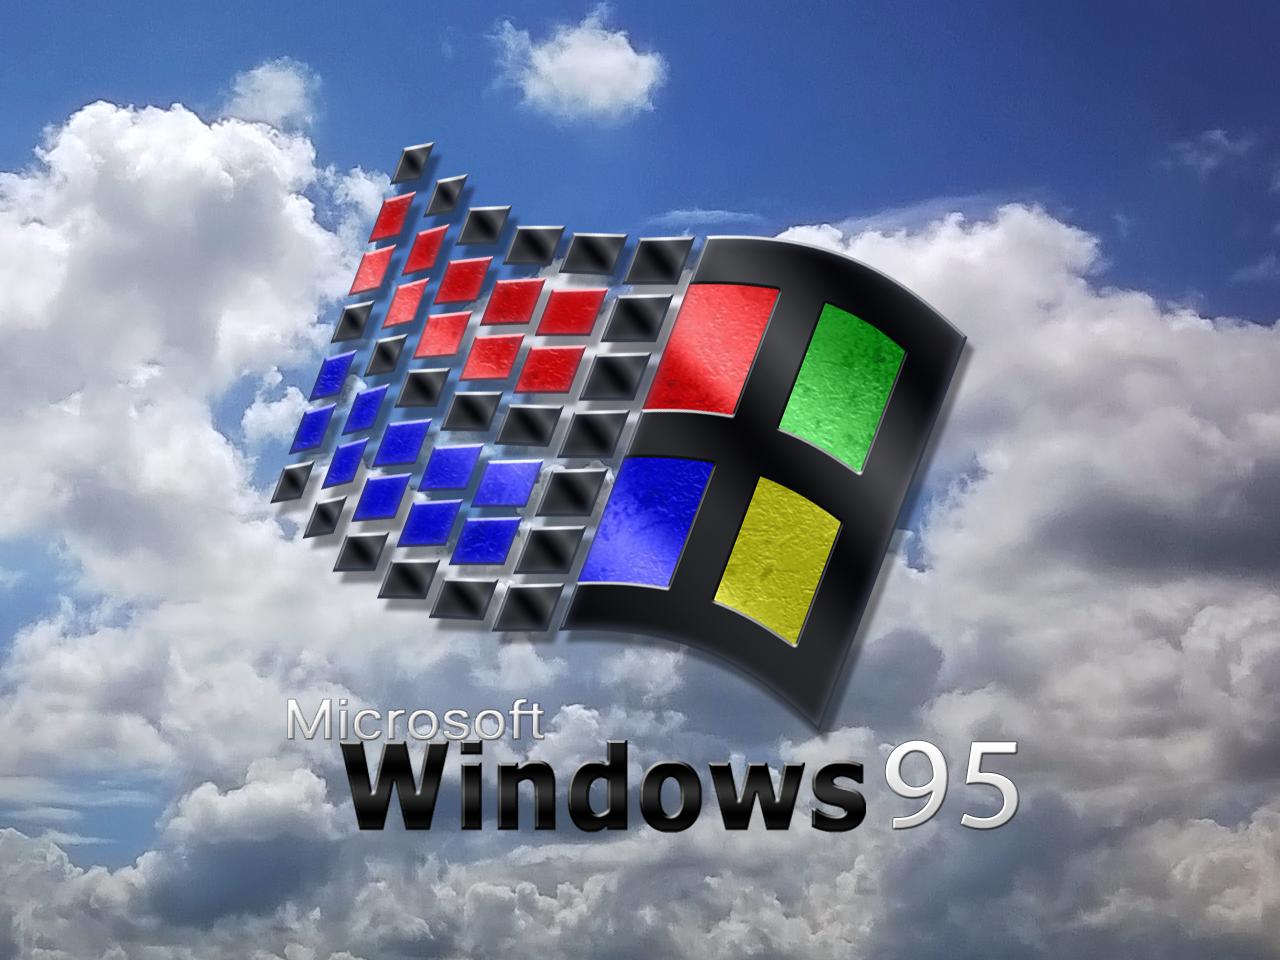 Windows 95 Wallpaper By Blueamnesiac On Deviantart